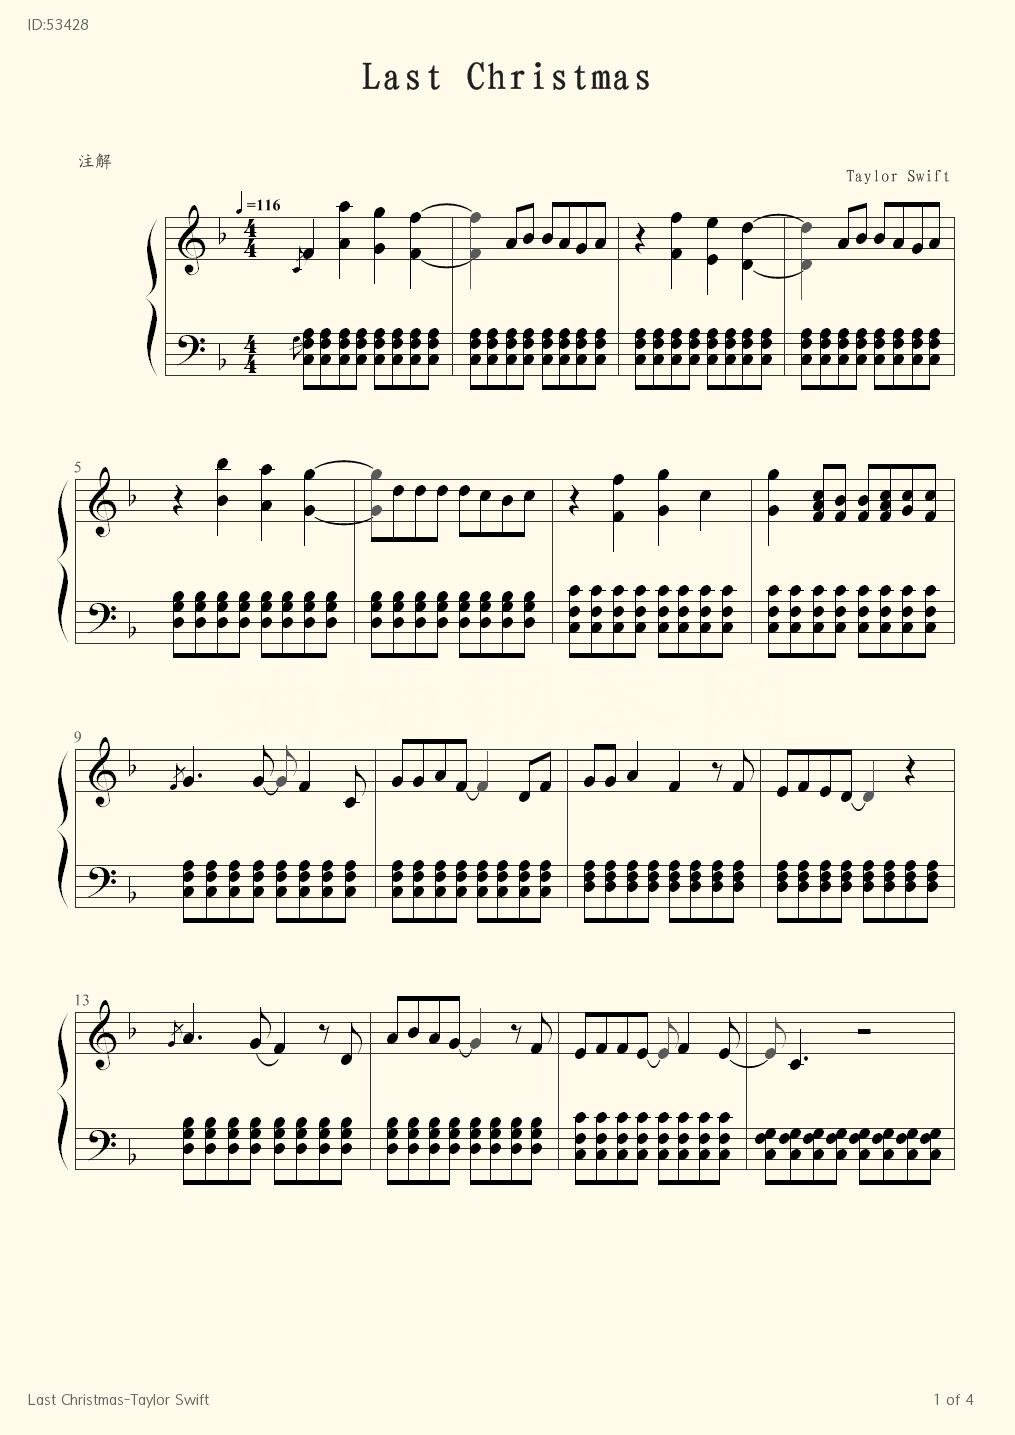 Last Christmas Taylor Swift Piano Score Taylor Swift Piano Music Fingering Sheet Music Bar